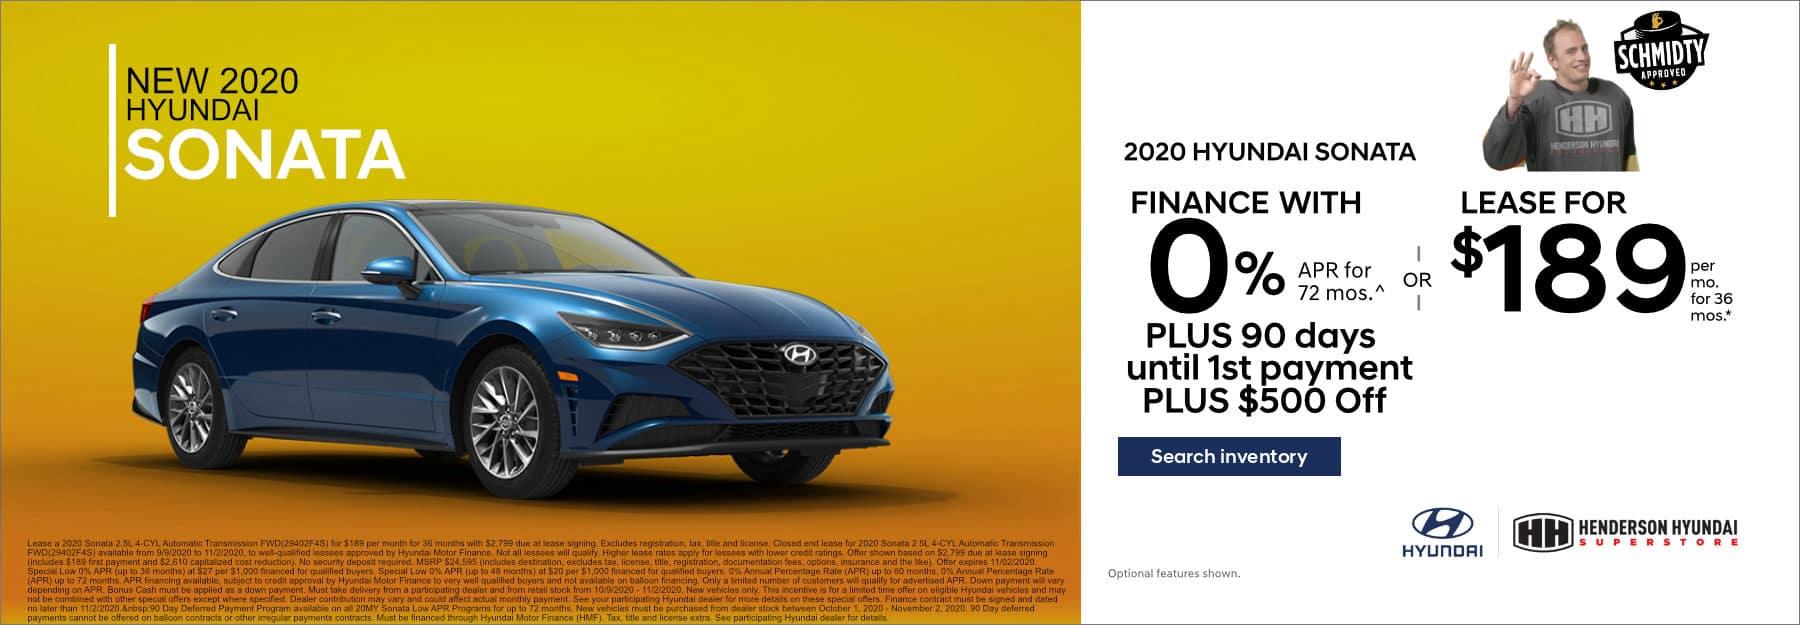 October-2020 Sonata_Henderson_Hyundai_1400x514